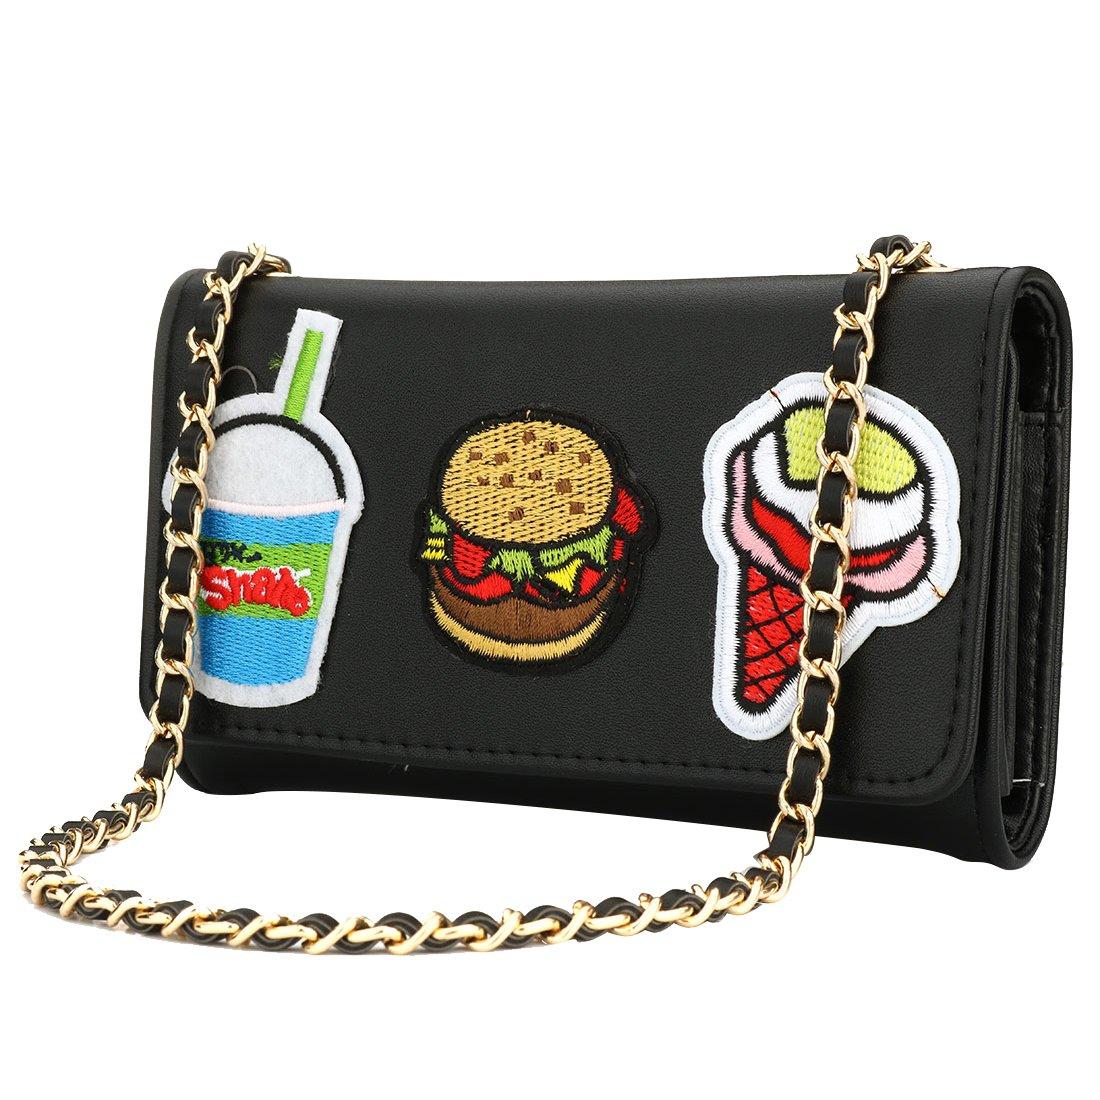 IBELLA Black Leather Evening Bag Cartoon Clutch Purse Wedding Party Prom Handbag with Crossbody Chain Strap